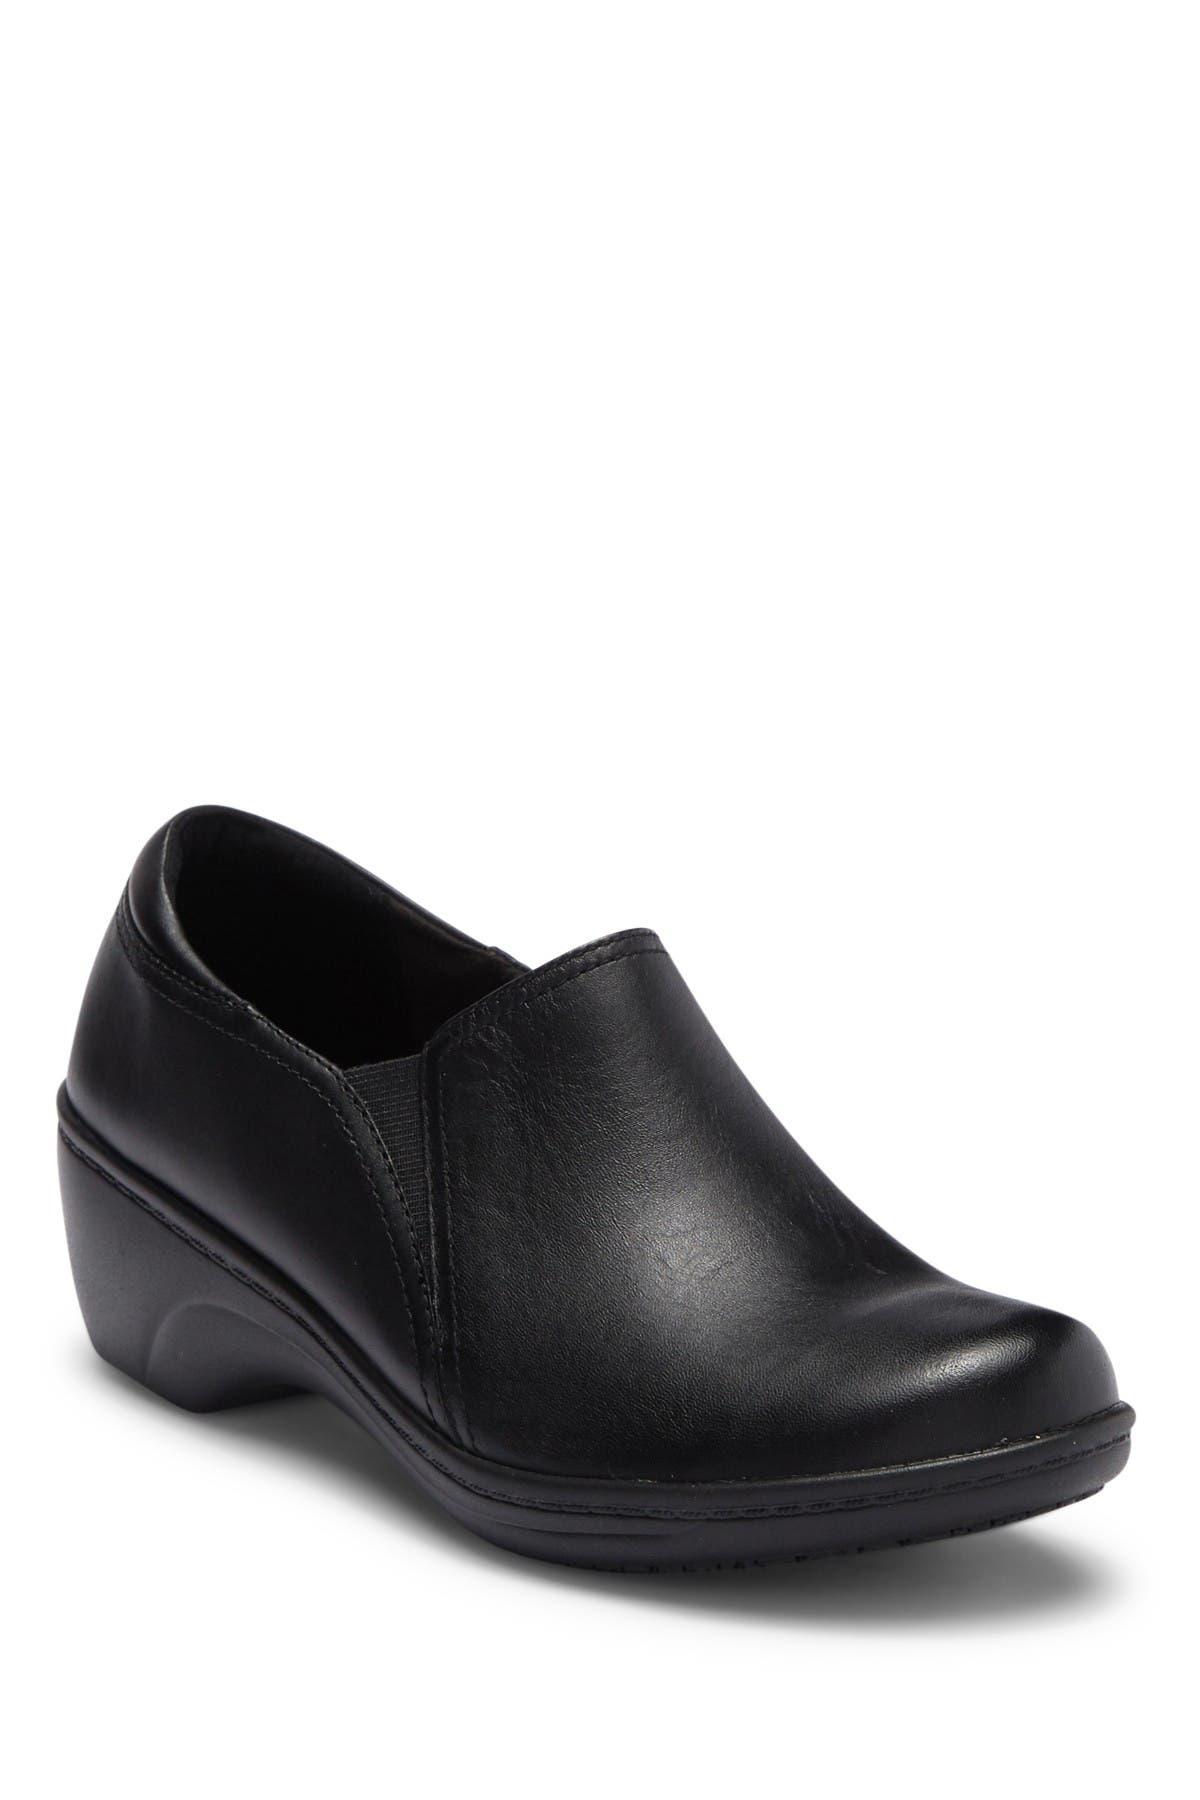 Clarks | Grasp Chime Leather Wedge Slip